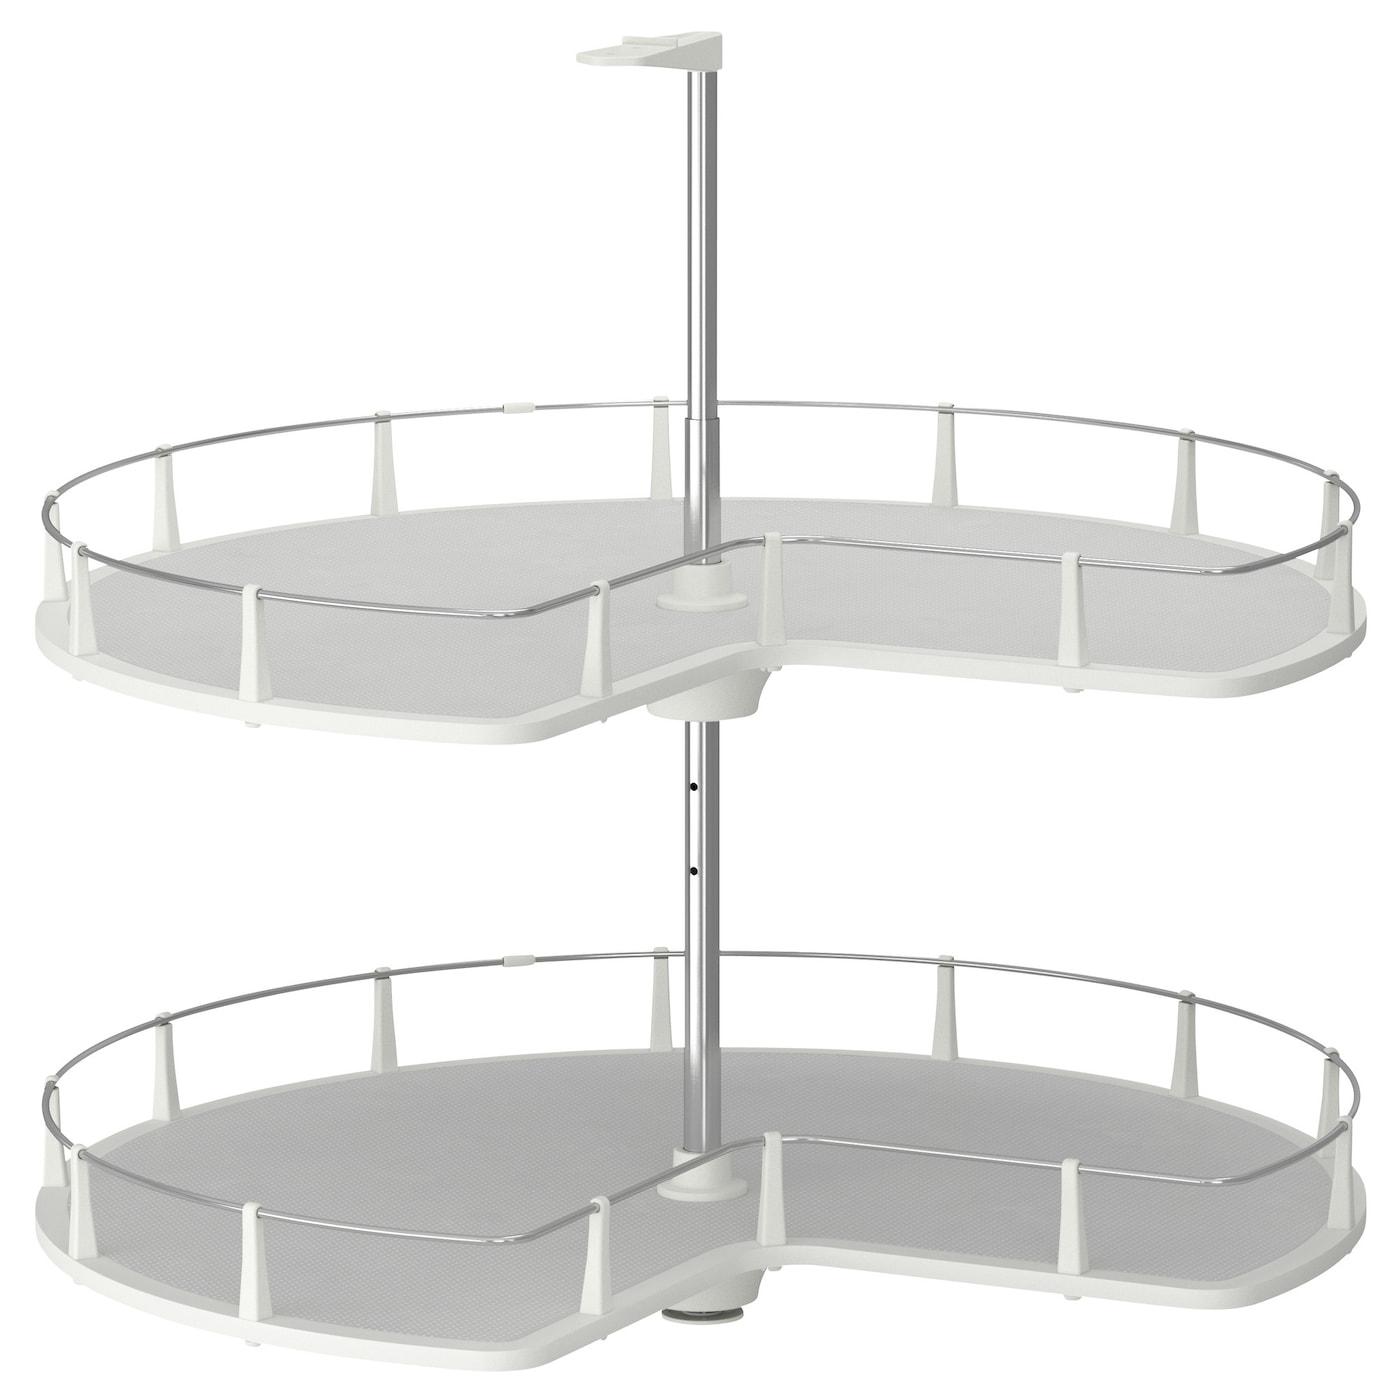 METOD Korpus Eckunterschrank - weiß - IKEA